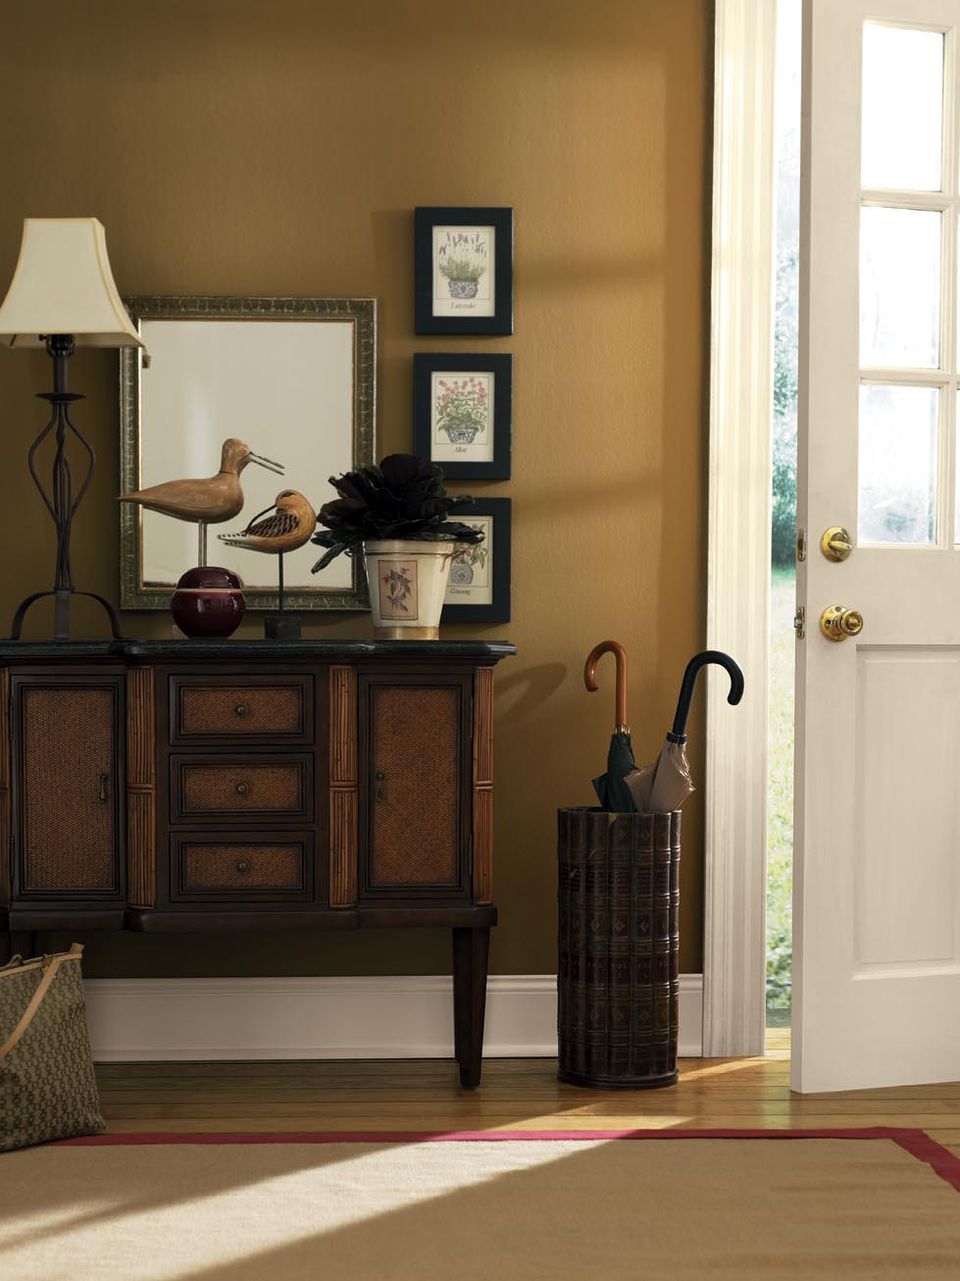 Designer 39 s top picks for foyer paint color for Designer s image